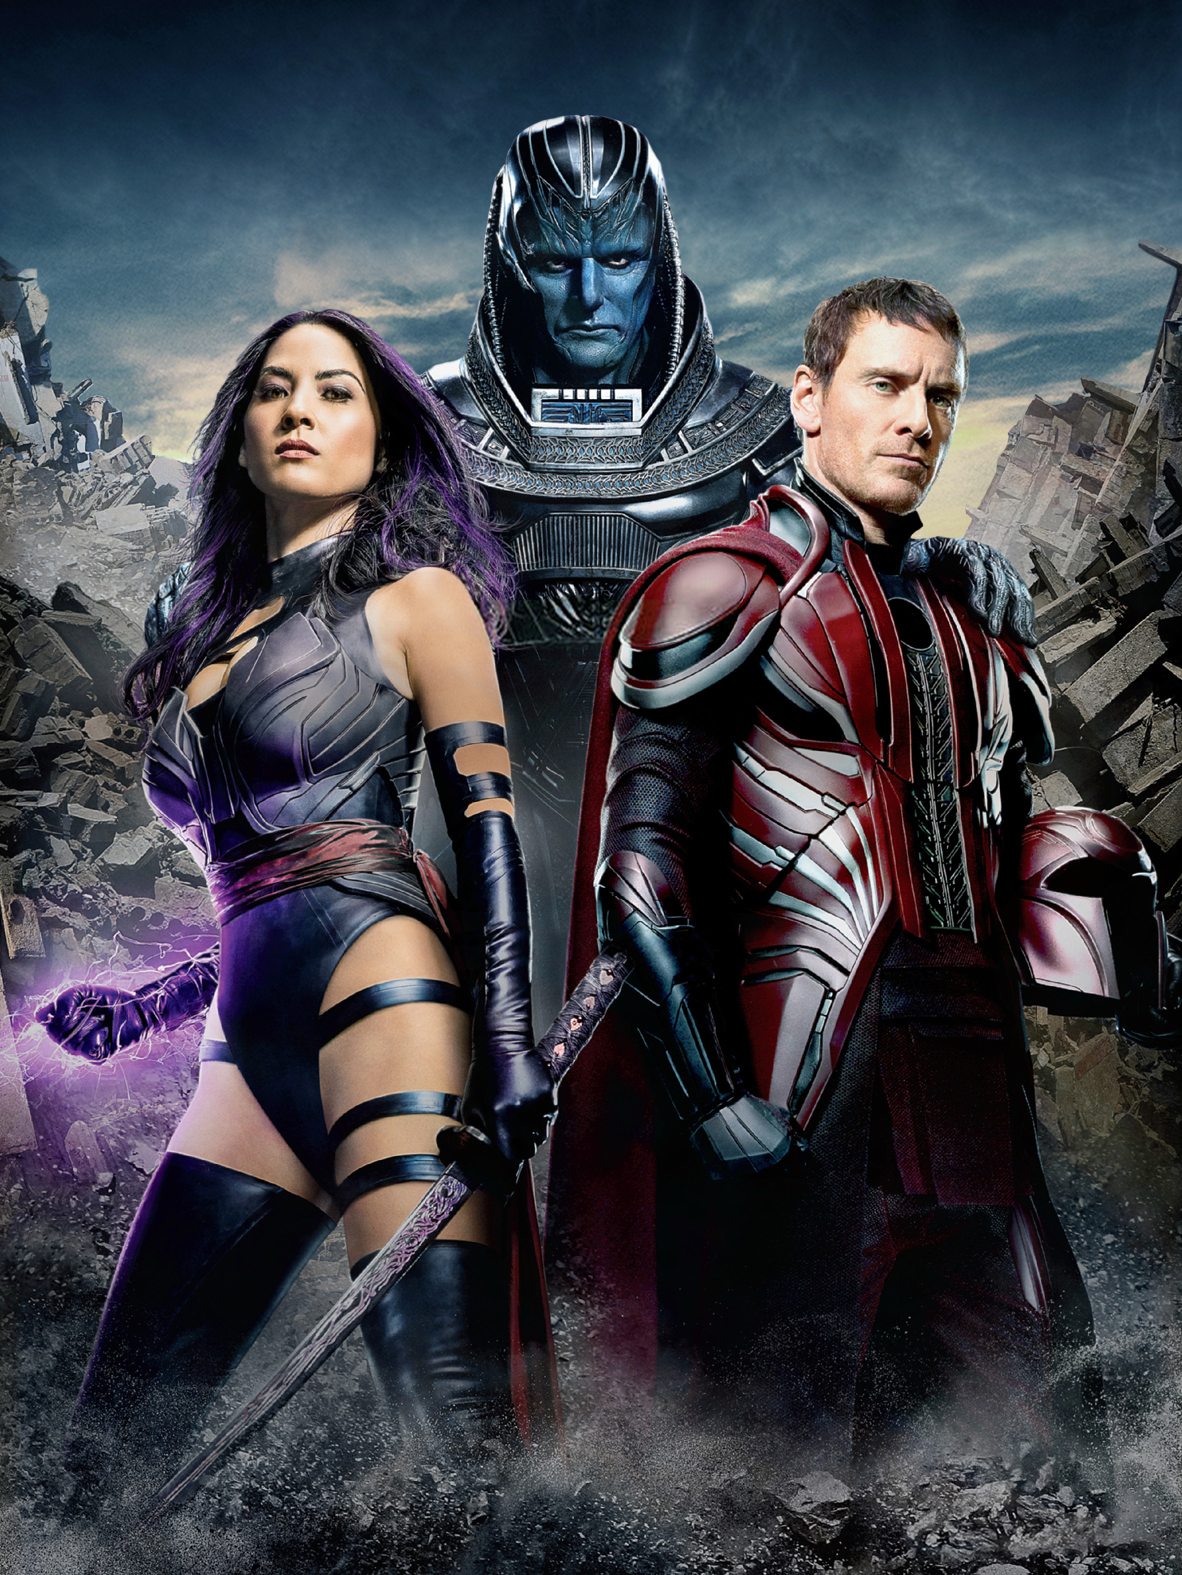 X-men: Apocalypse (2016) images X Men Apocalypse Poster HD ...